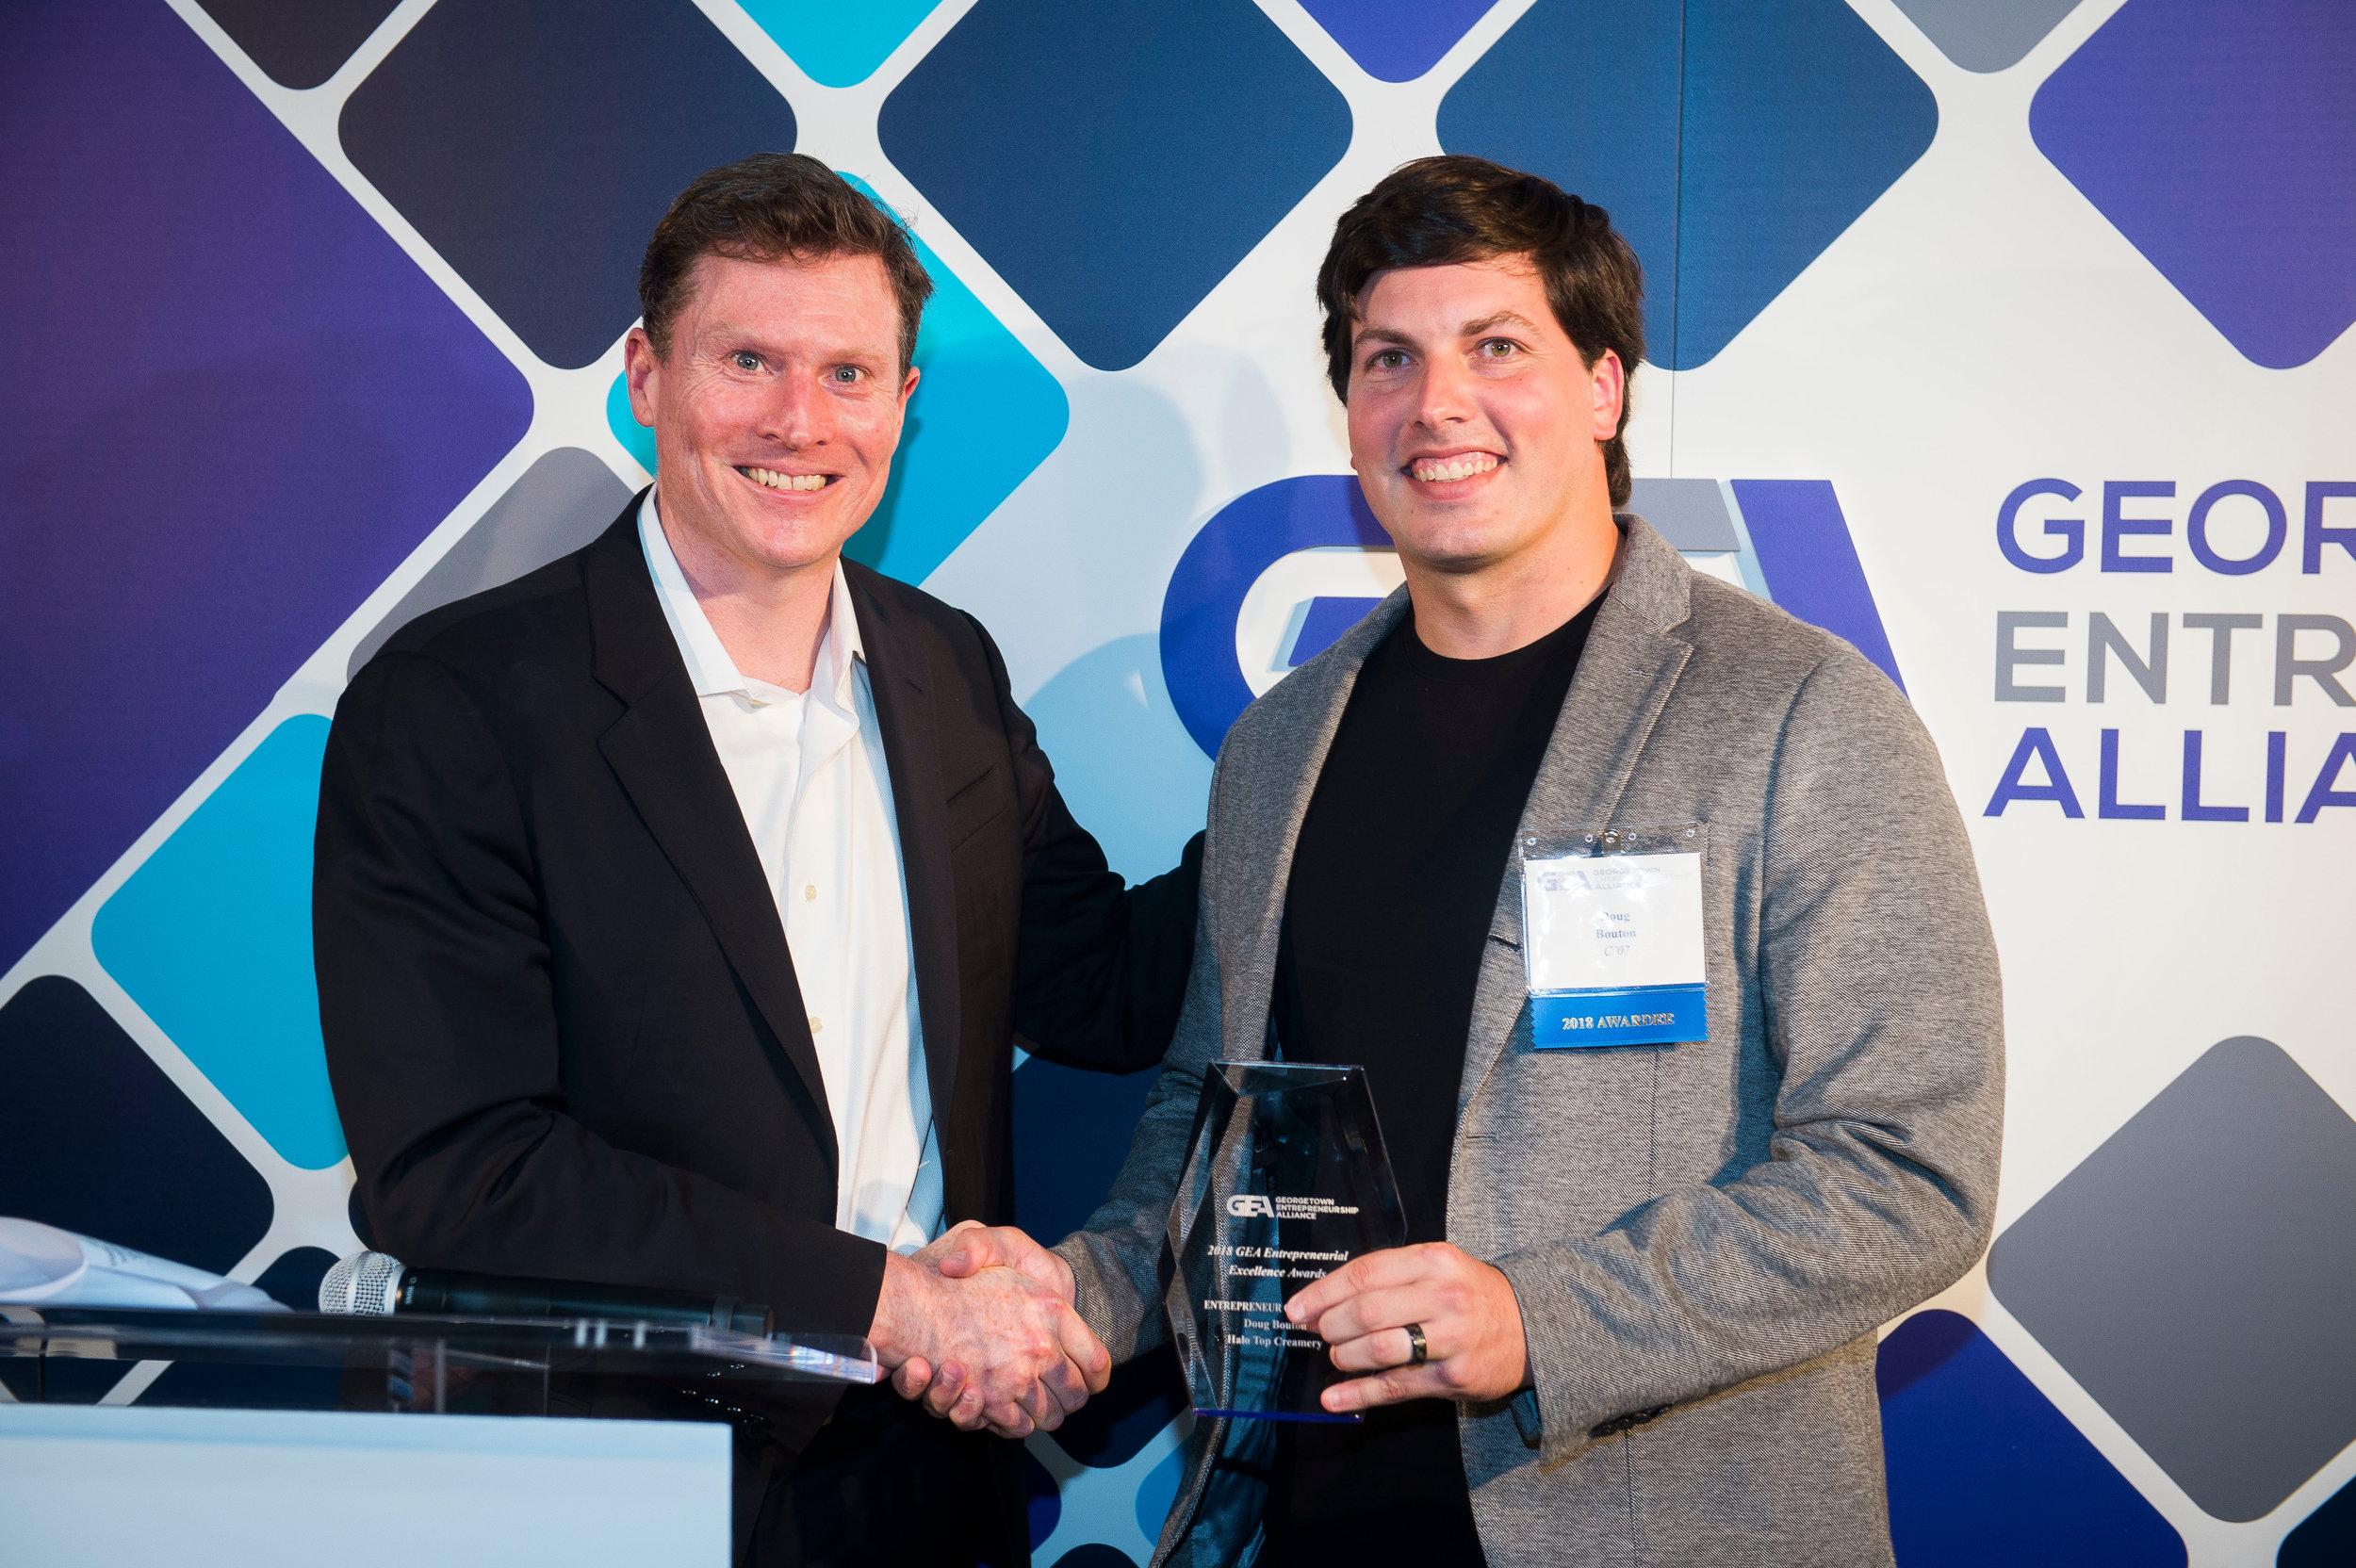 Doug Bouton (C'07), President & COO, Halo Top Creamery — 2018 Entrepreneur of the Year